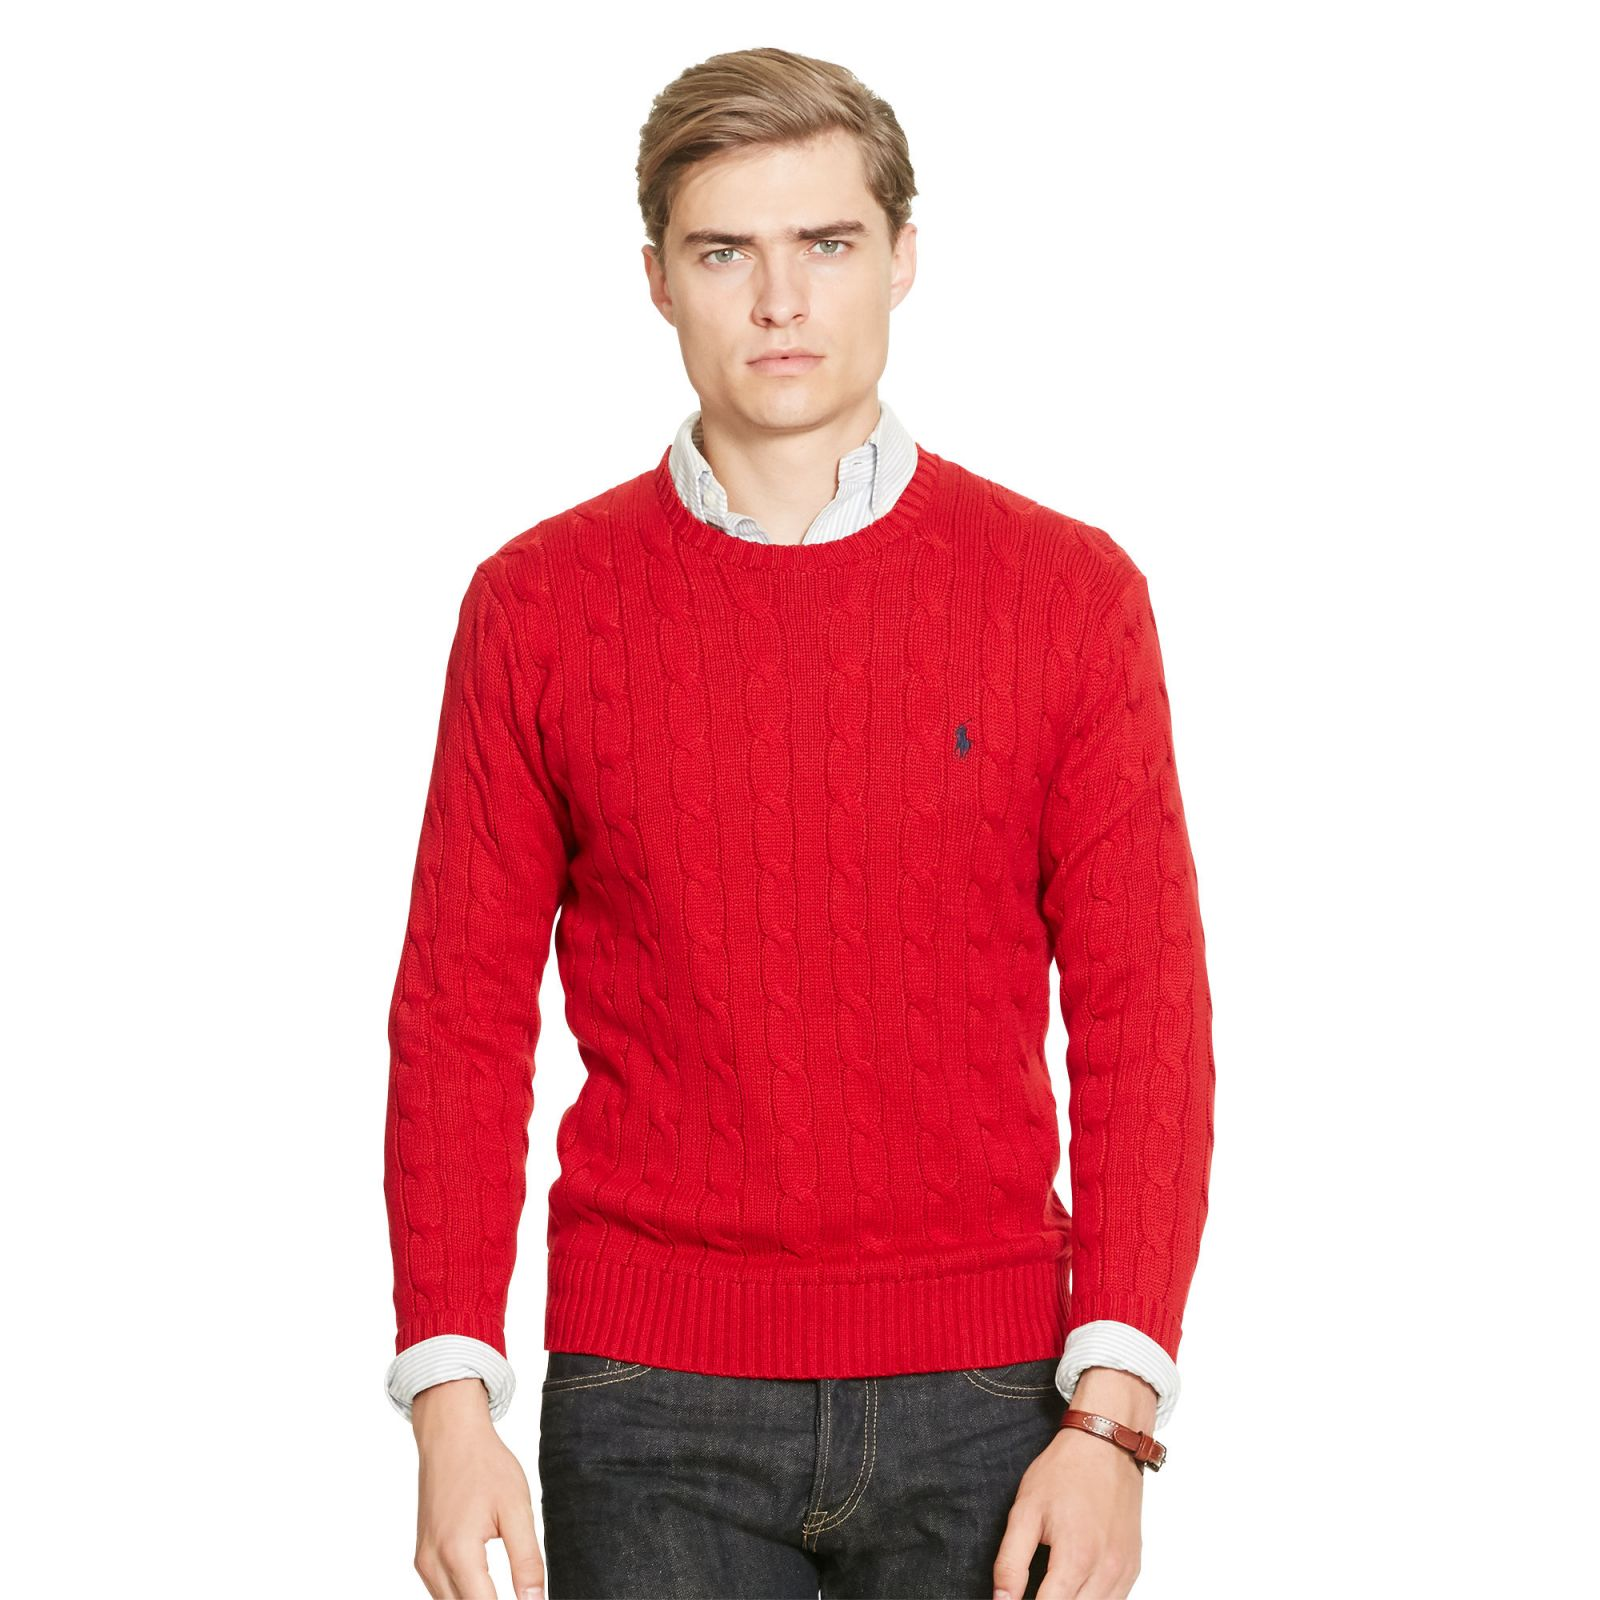 Ralph Lauren svetr Cable - Knit Tussah Silk Sweater červená